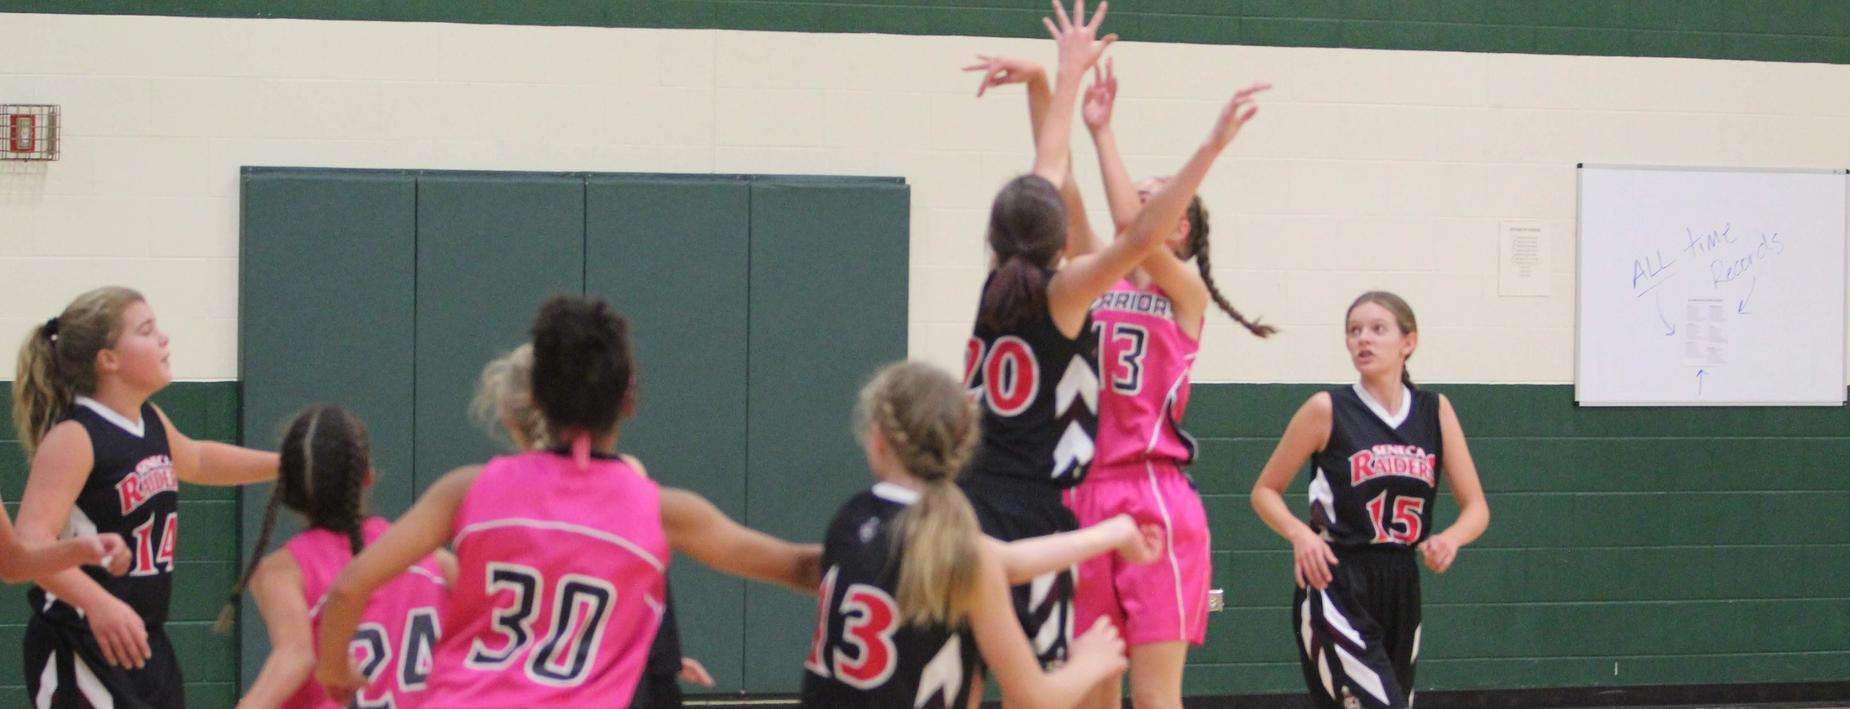 Girls Basketball - Middle School